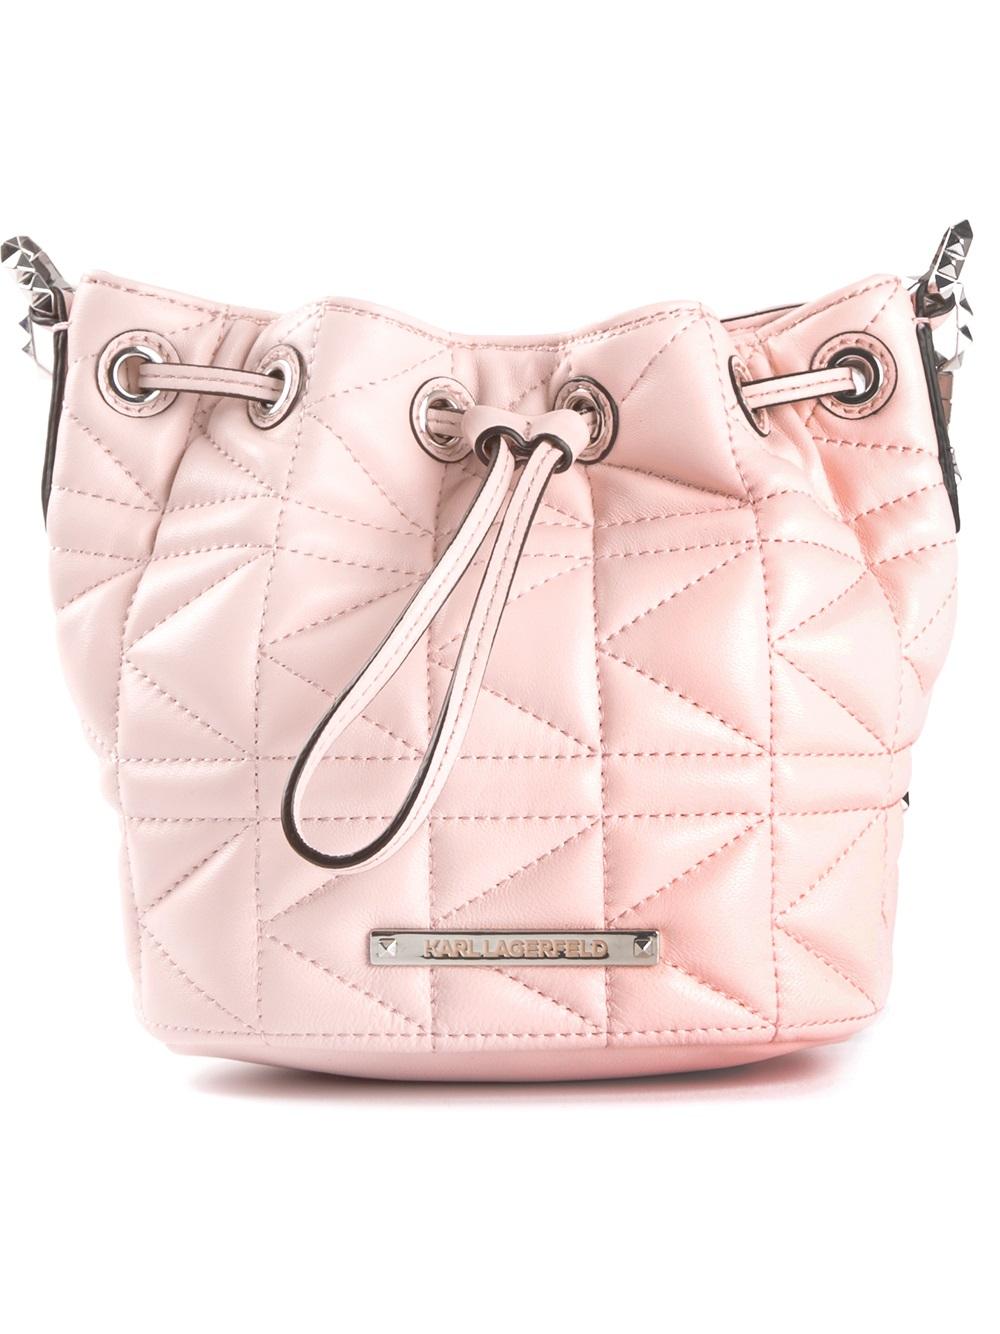 quilted shoulder bag - Pink & Purple Karl Lagerfeld wavph3